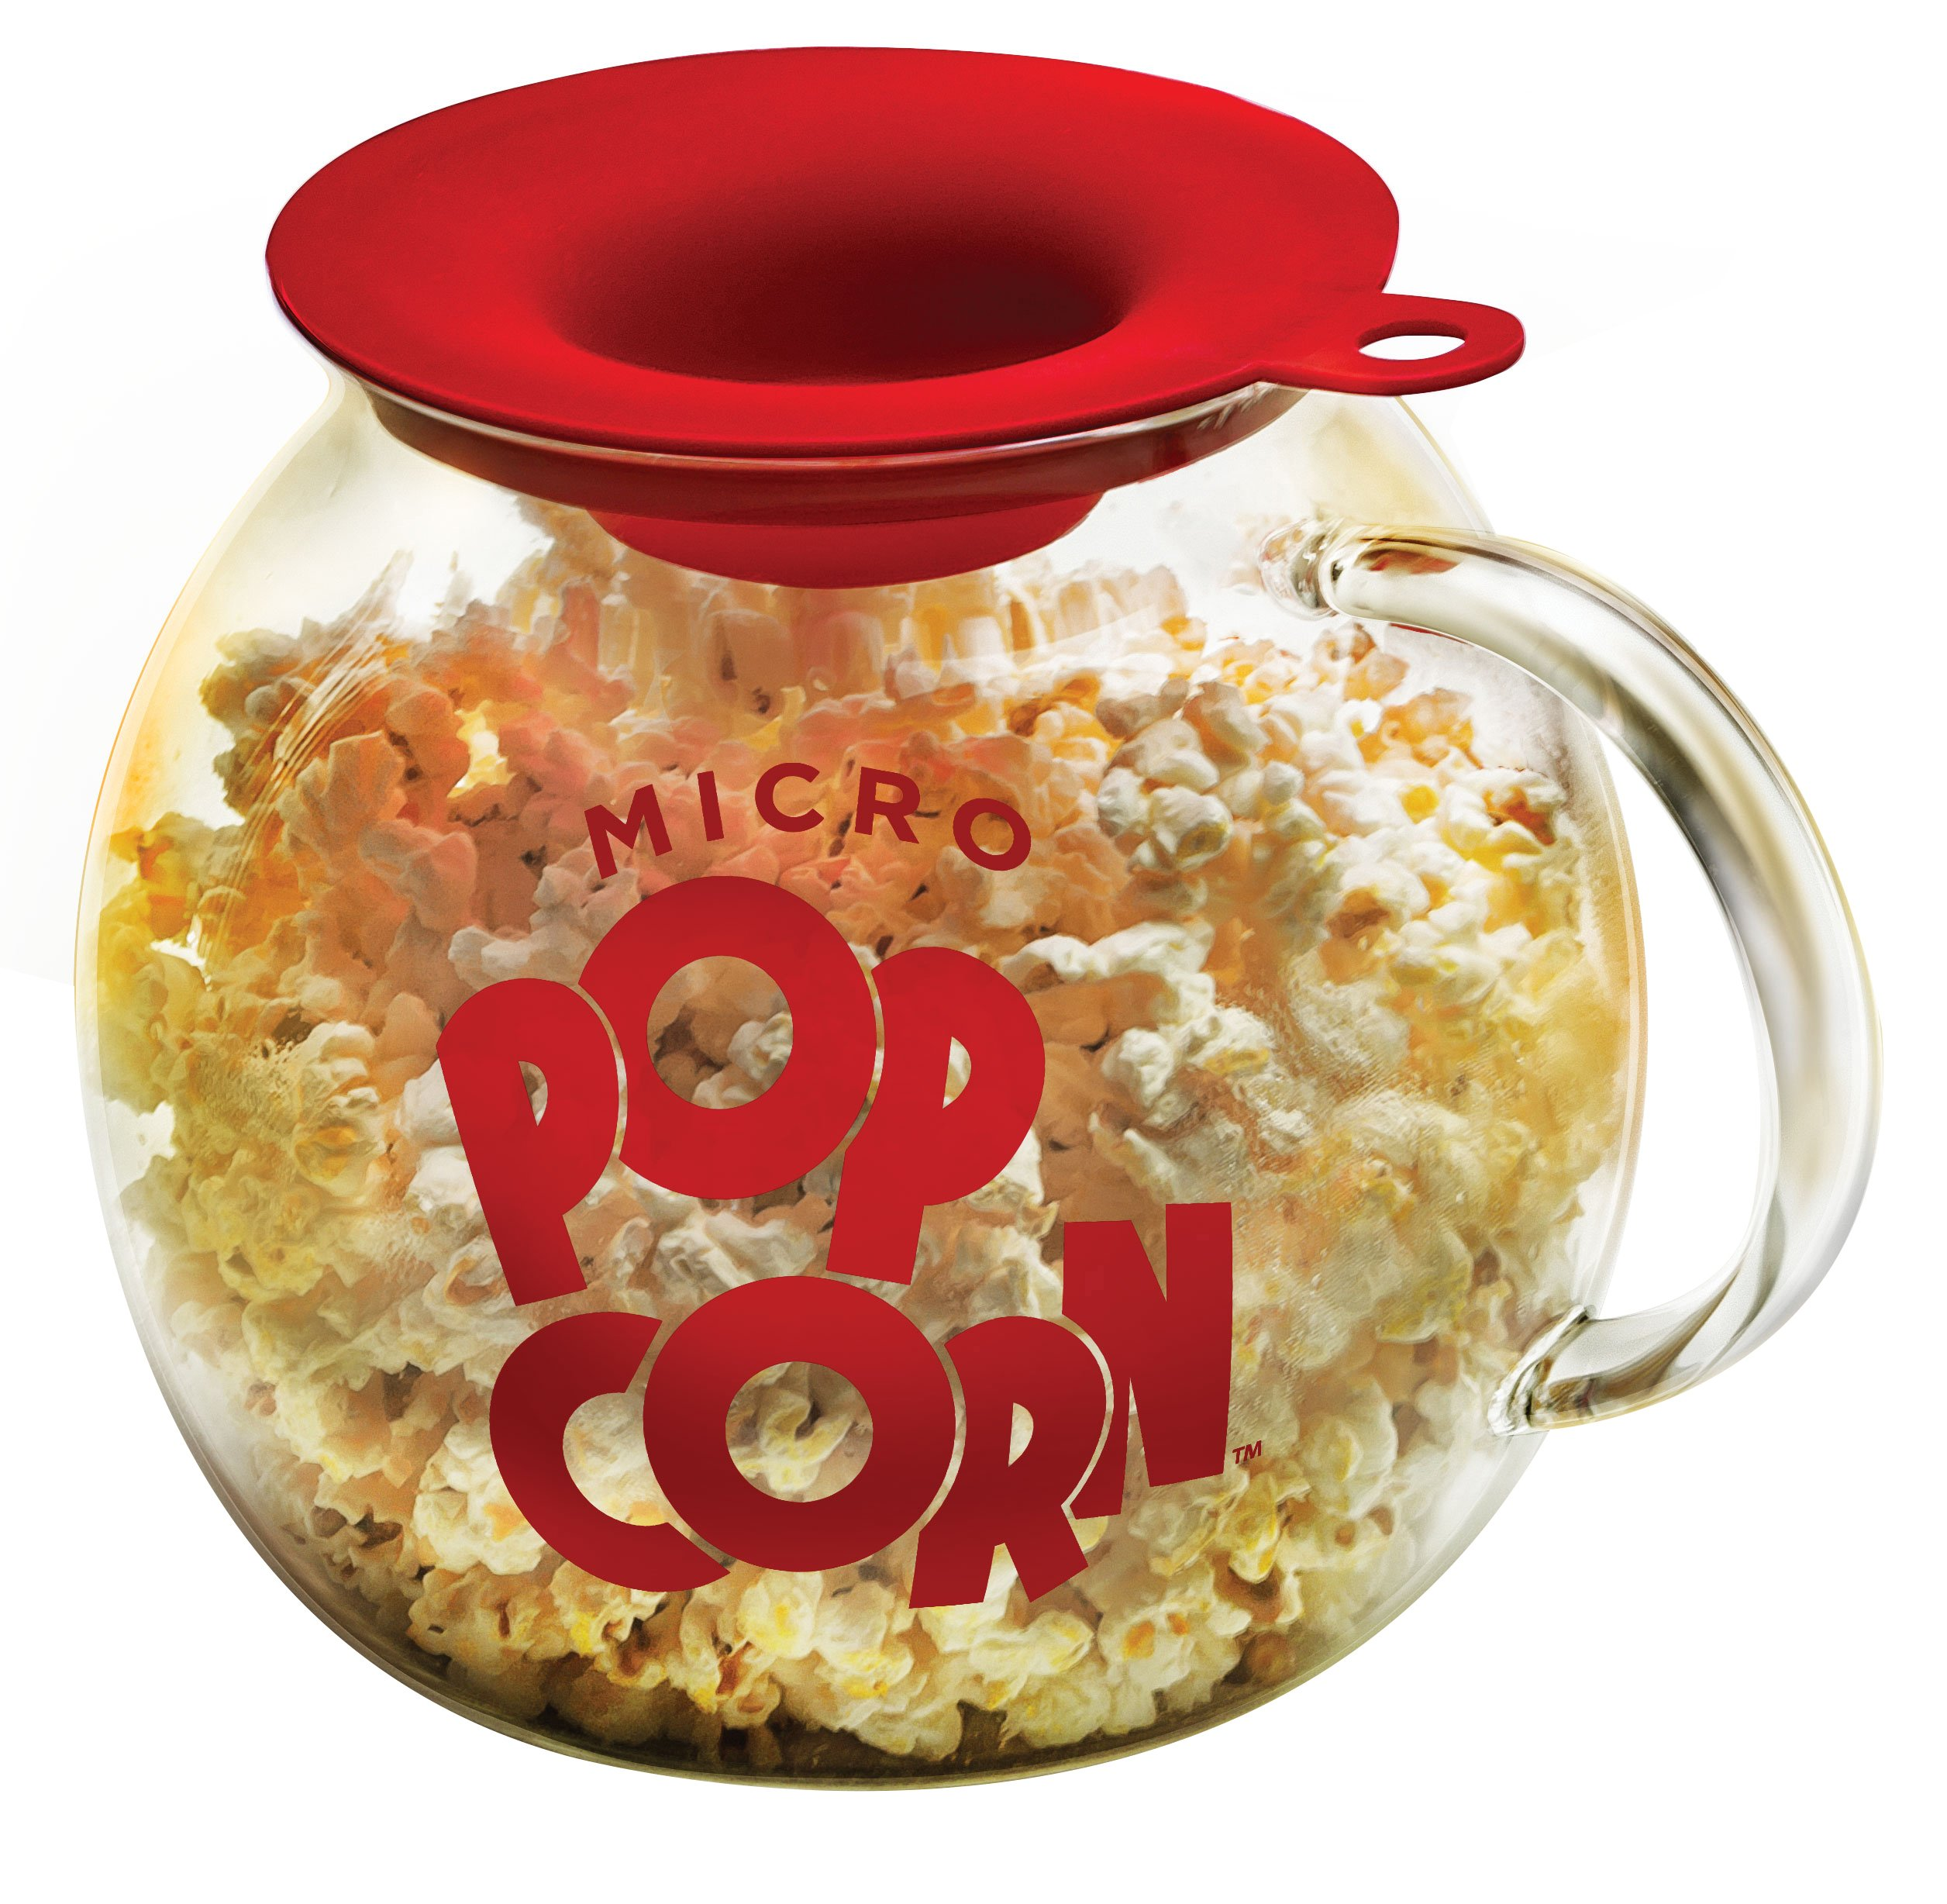 göra popcorn i micro